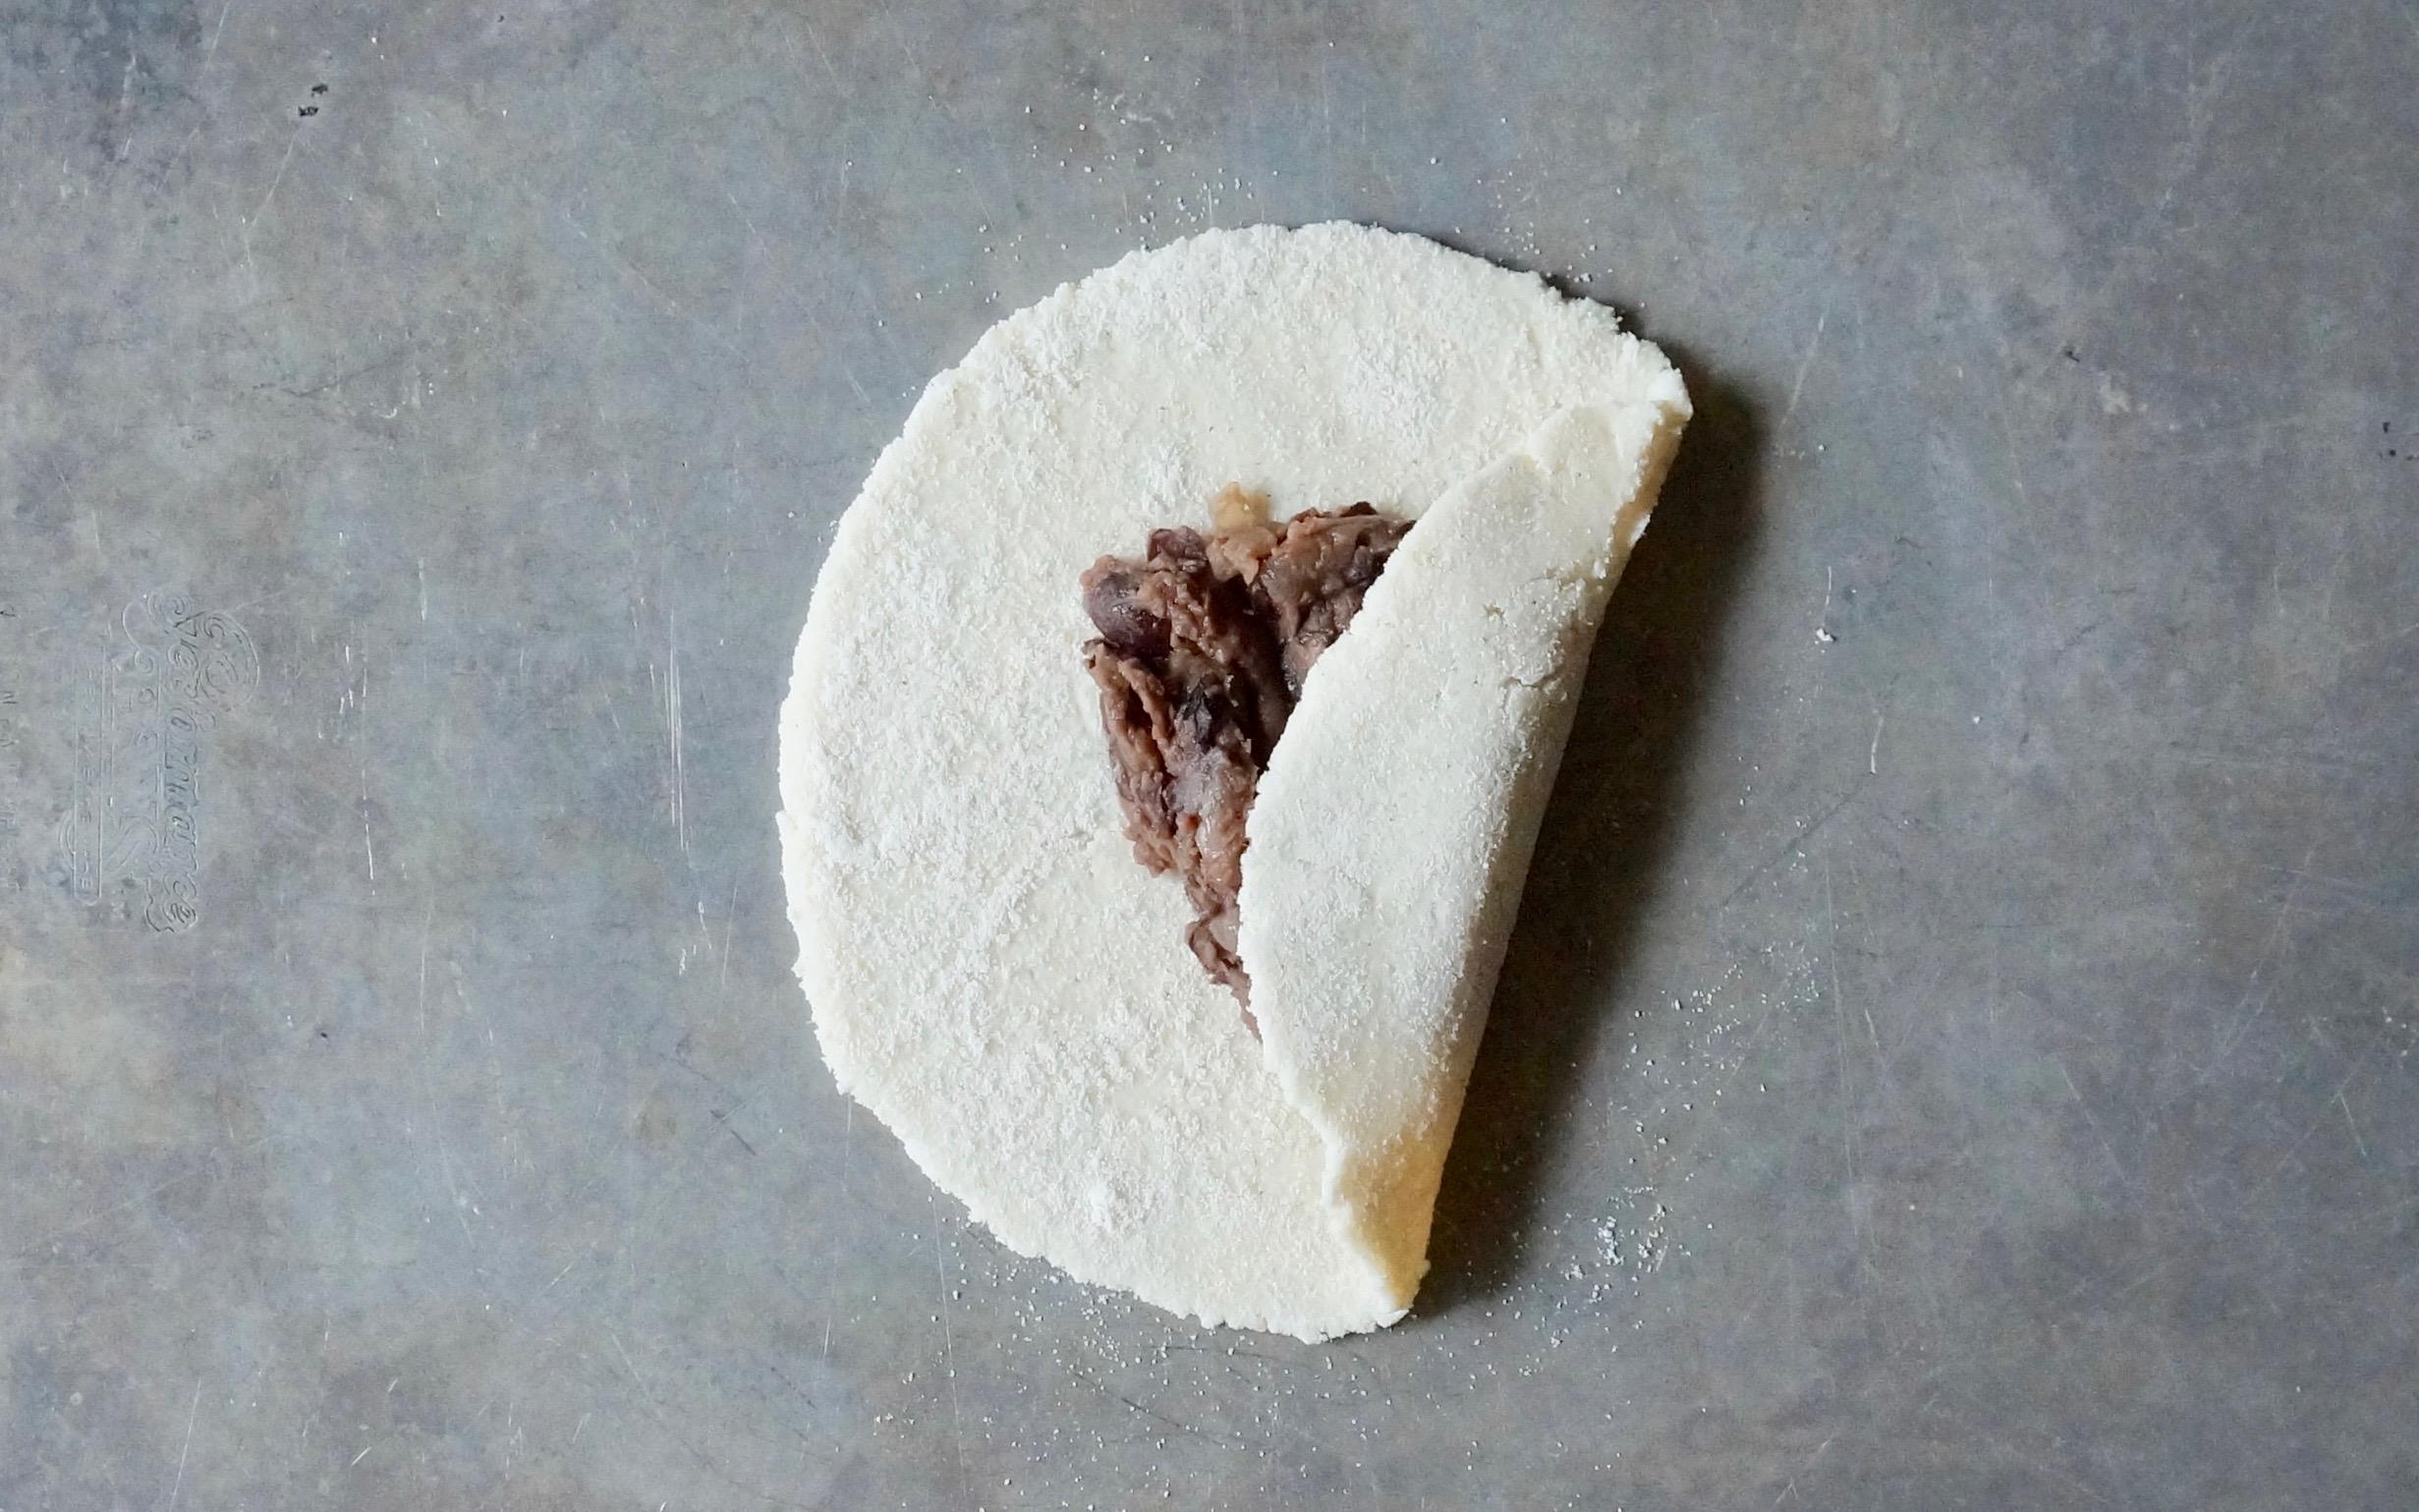 How-To-Make-Tetelas-Oaxaca-Rebecca-Gordon-Editor-In-Chief-Buttermilk-Lipstick-Cooking-Class-Southern-Entertaining-RebeccaGordon-Southern-Hostess-Pastry-Chef-Gardener-Birmingham-Alabama